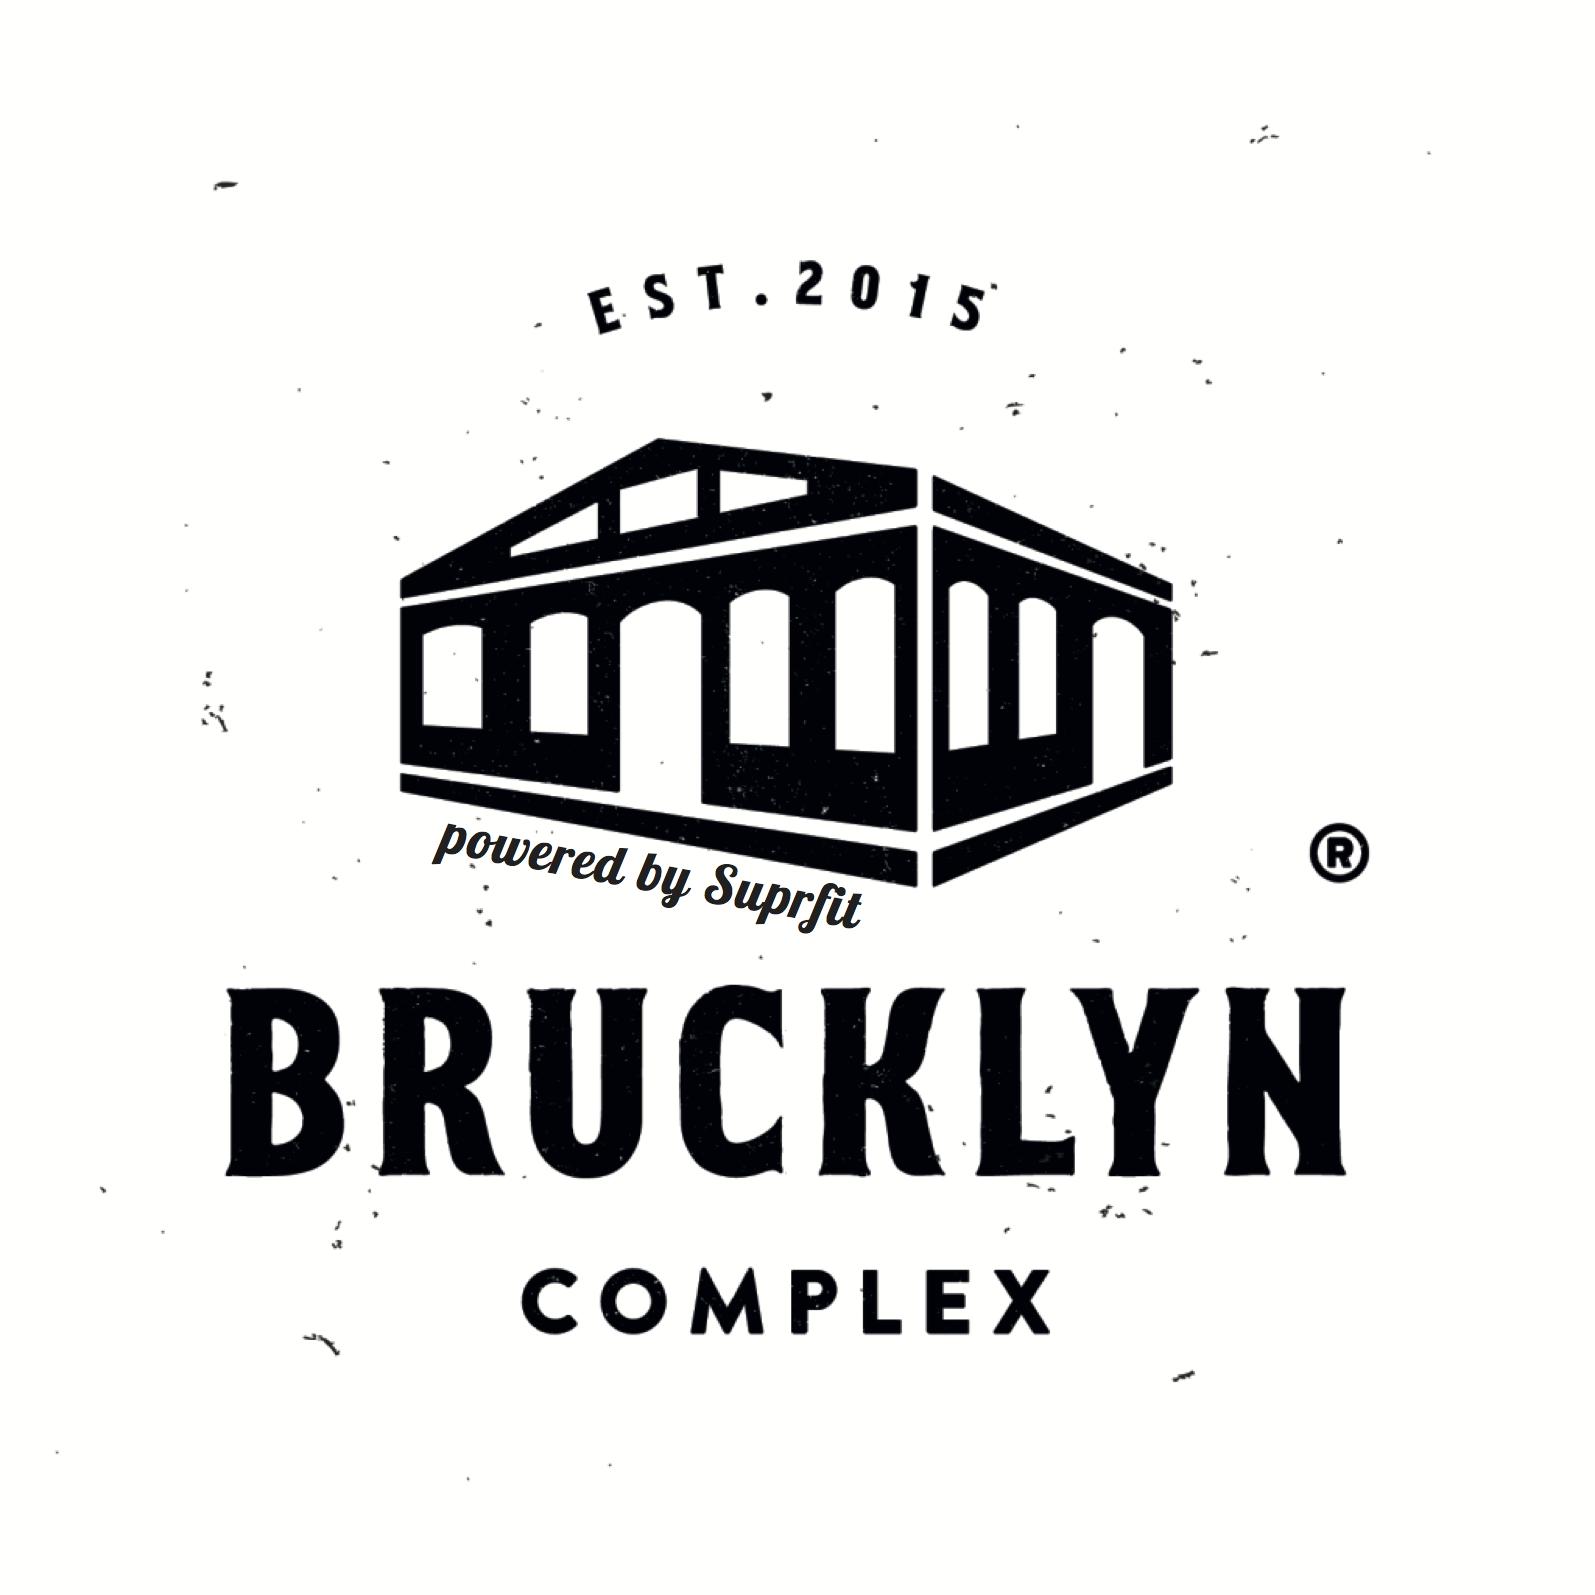 brucklyn-complex-logo_suprfit-v1